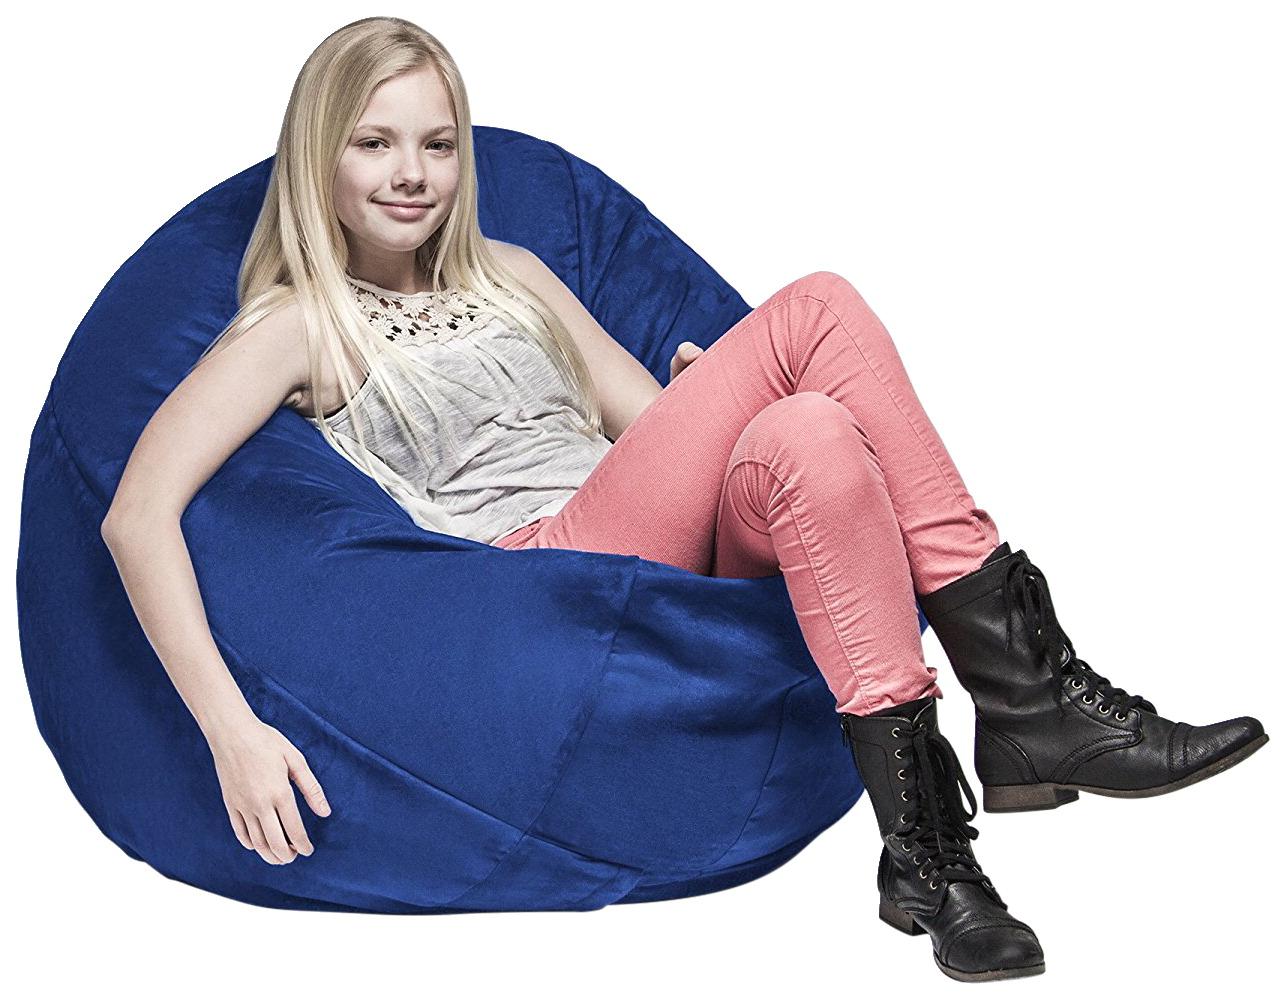 Astonishing Jaxx Cocoon Kids Bean Bag Chair 45 X 45 X 16 Inches Various Options Uwap Interior Chair Design Uwaporg